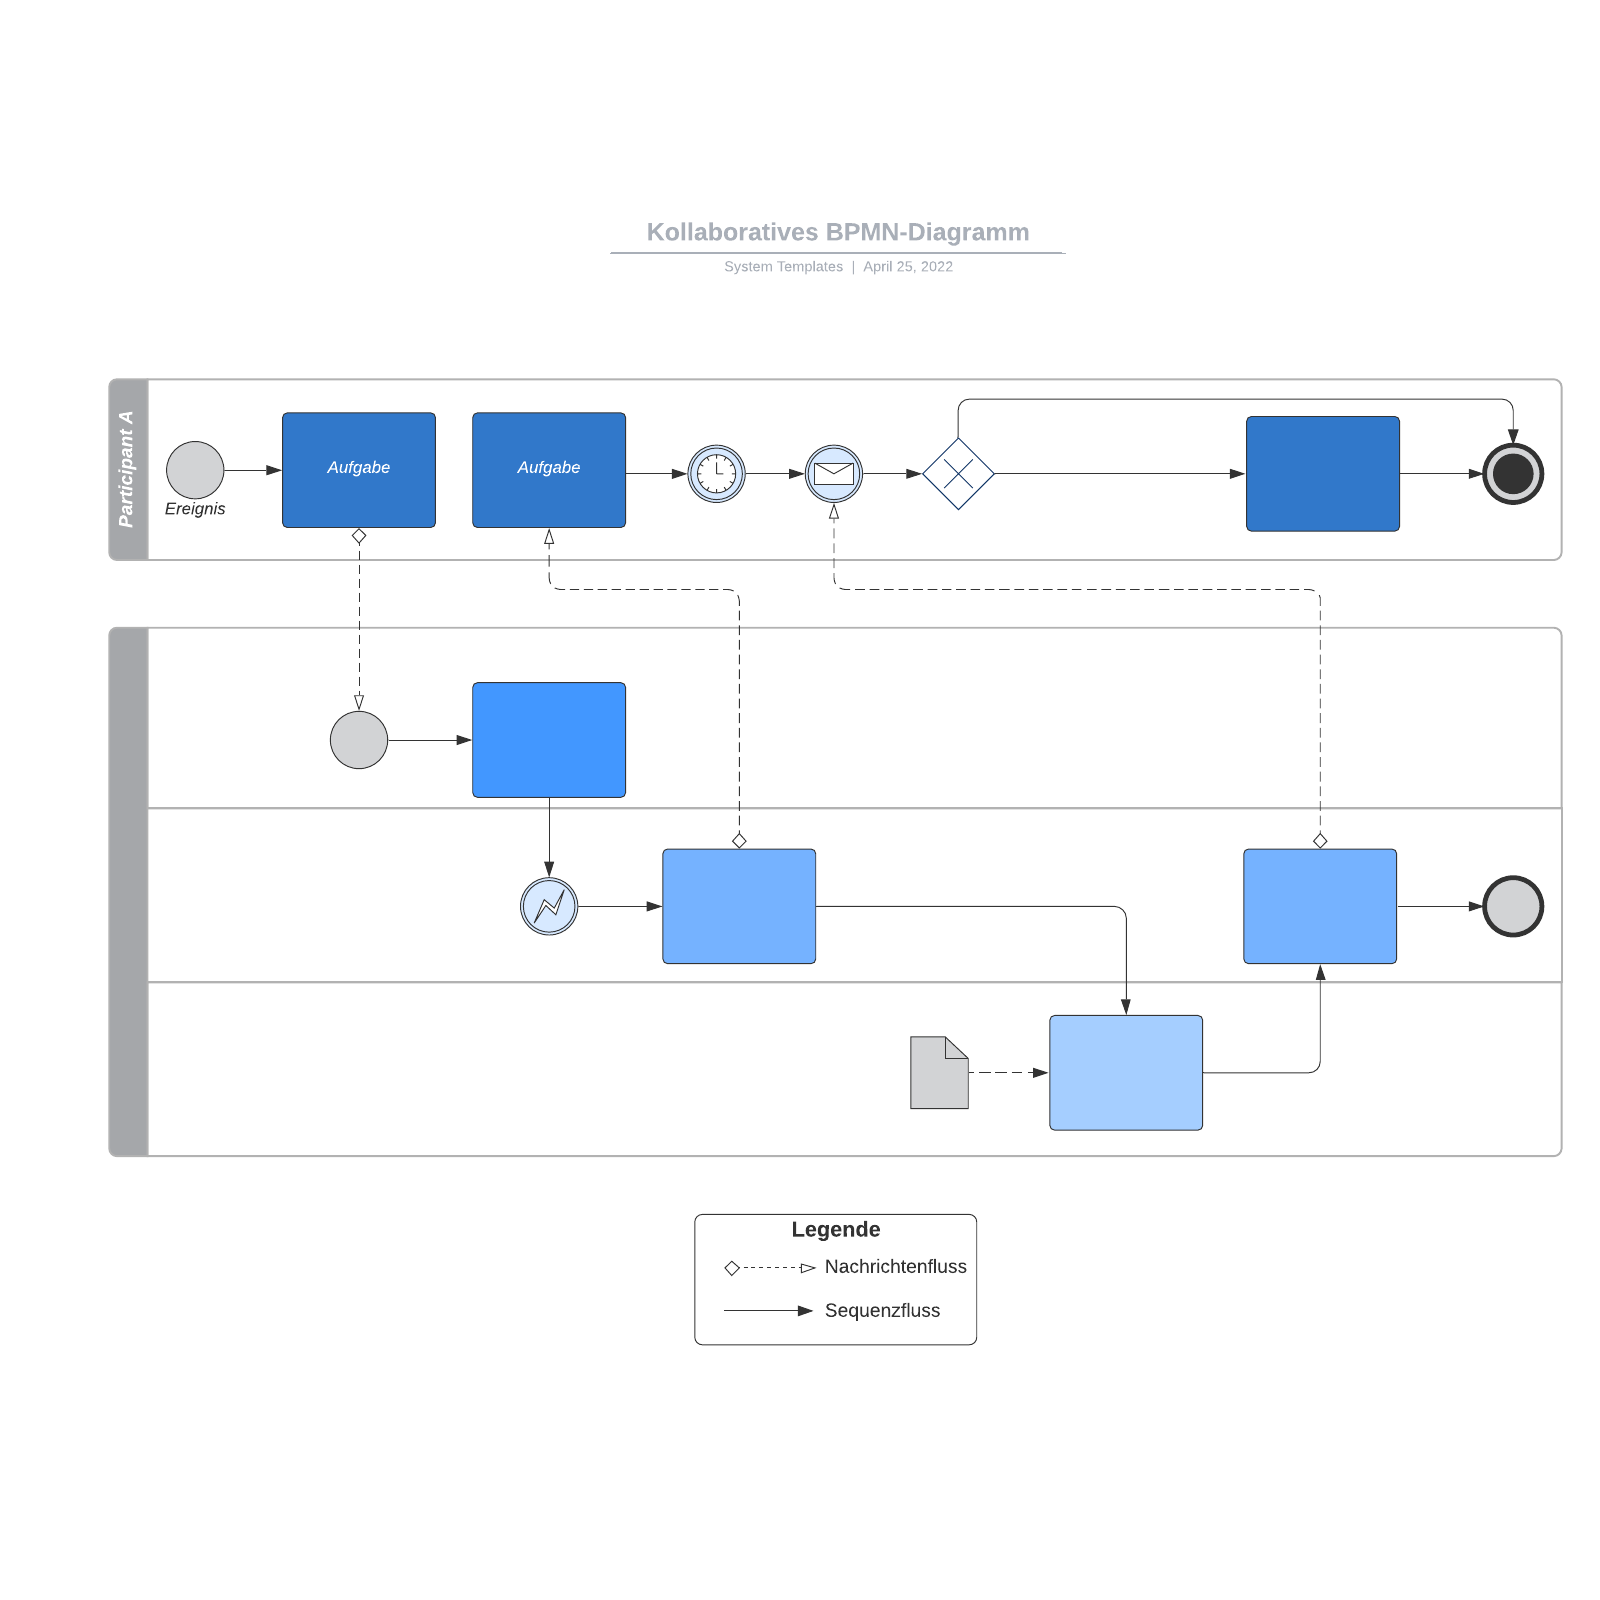 Kollaboratives BPMN-Diagramm - Vorlage